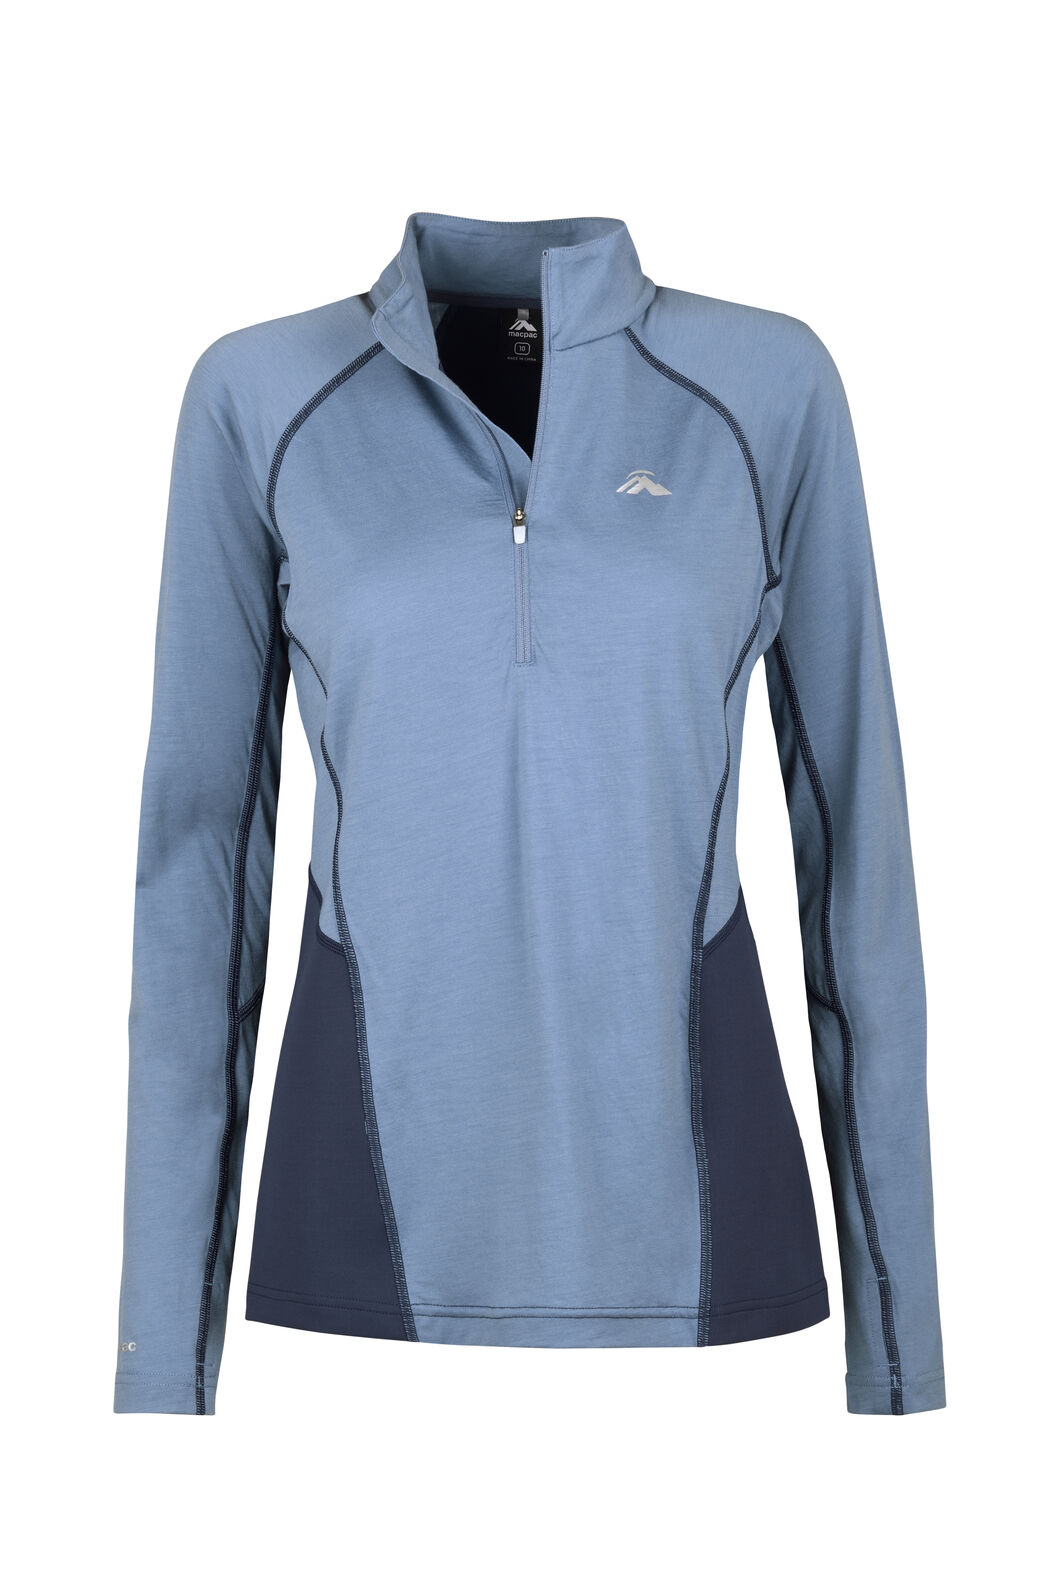 Macpac Casswell Long Sleeve Shirt — Women's, China Blue/Mood Indigo, hi-res